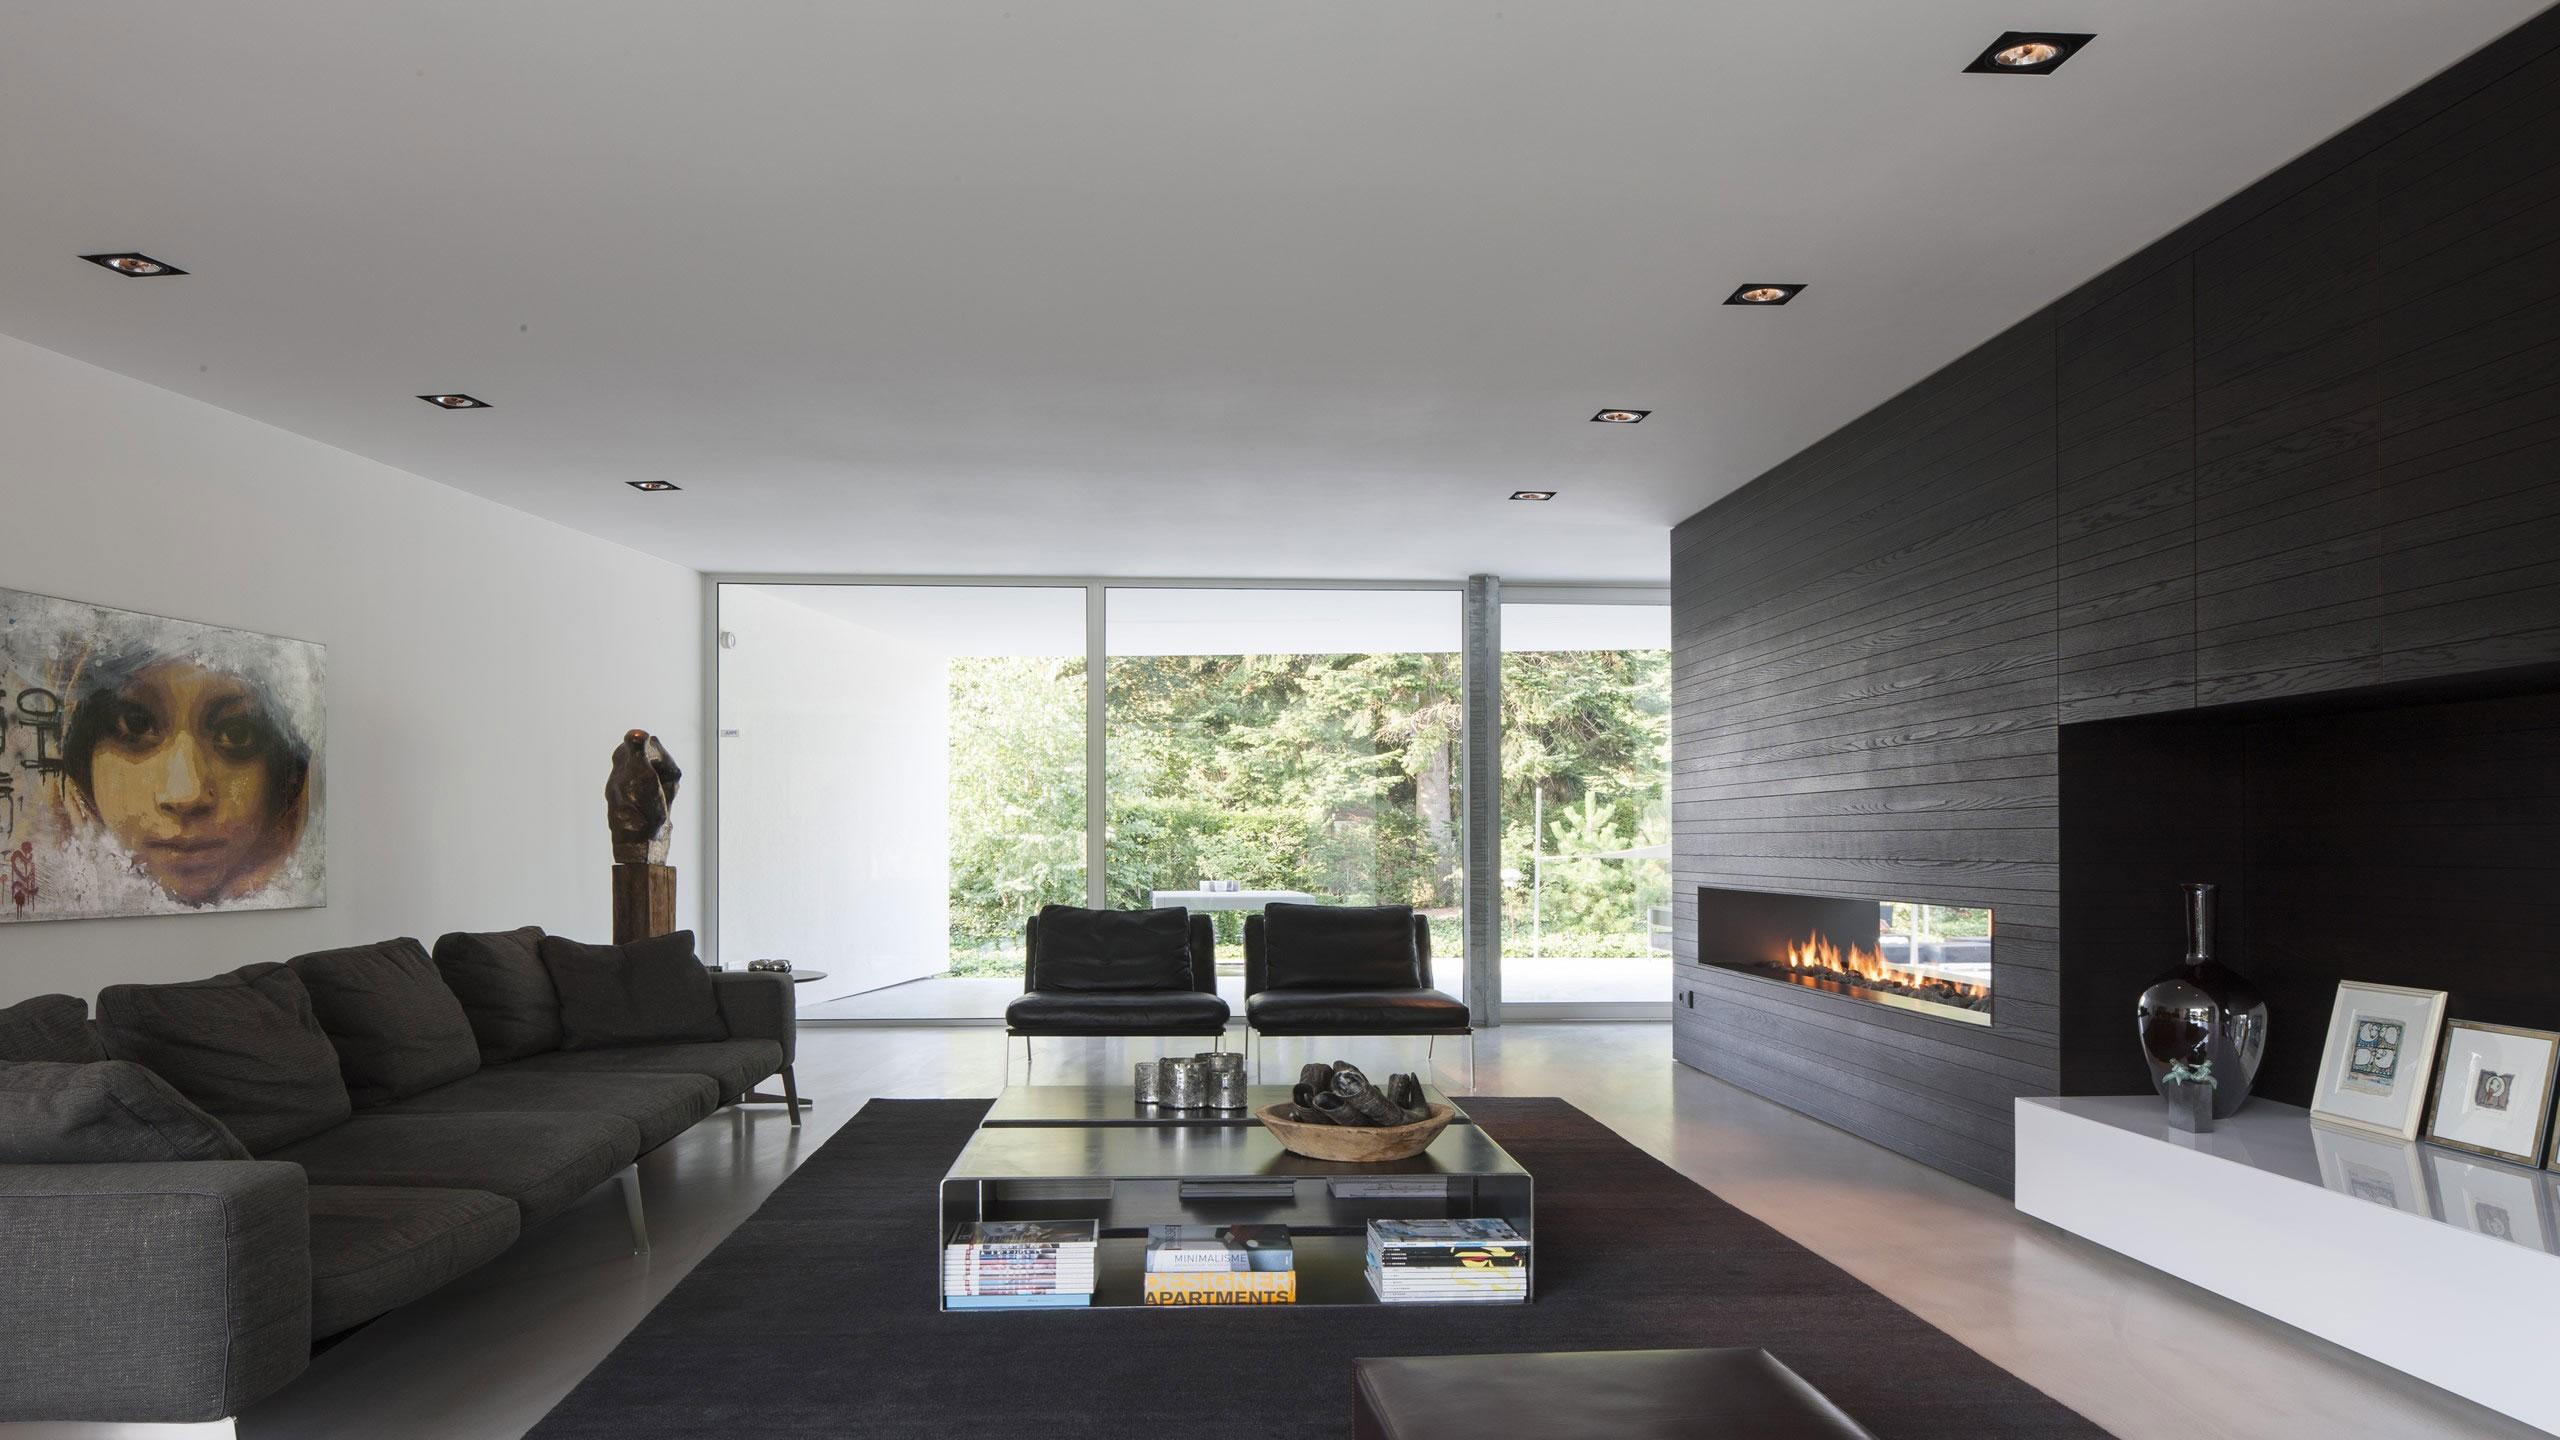 Boxed Villa Spee Haelen with Panoramic Windows by Lab32 architecten-15